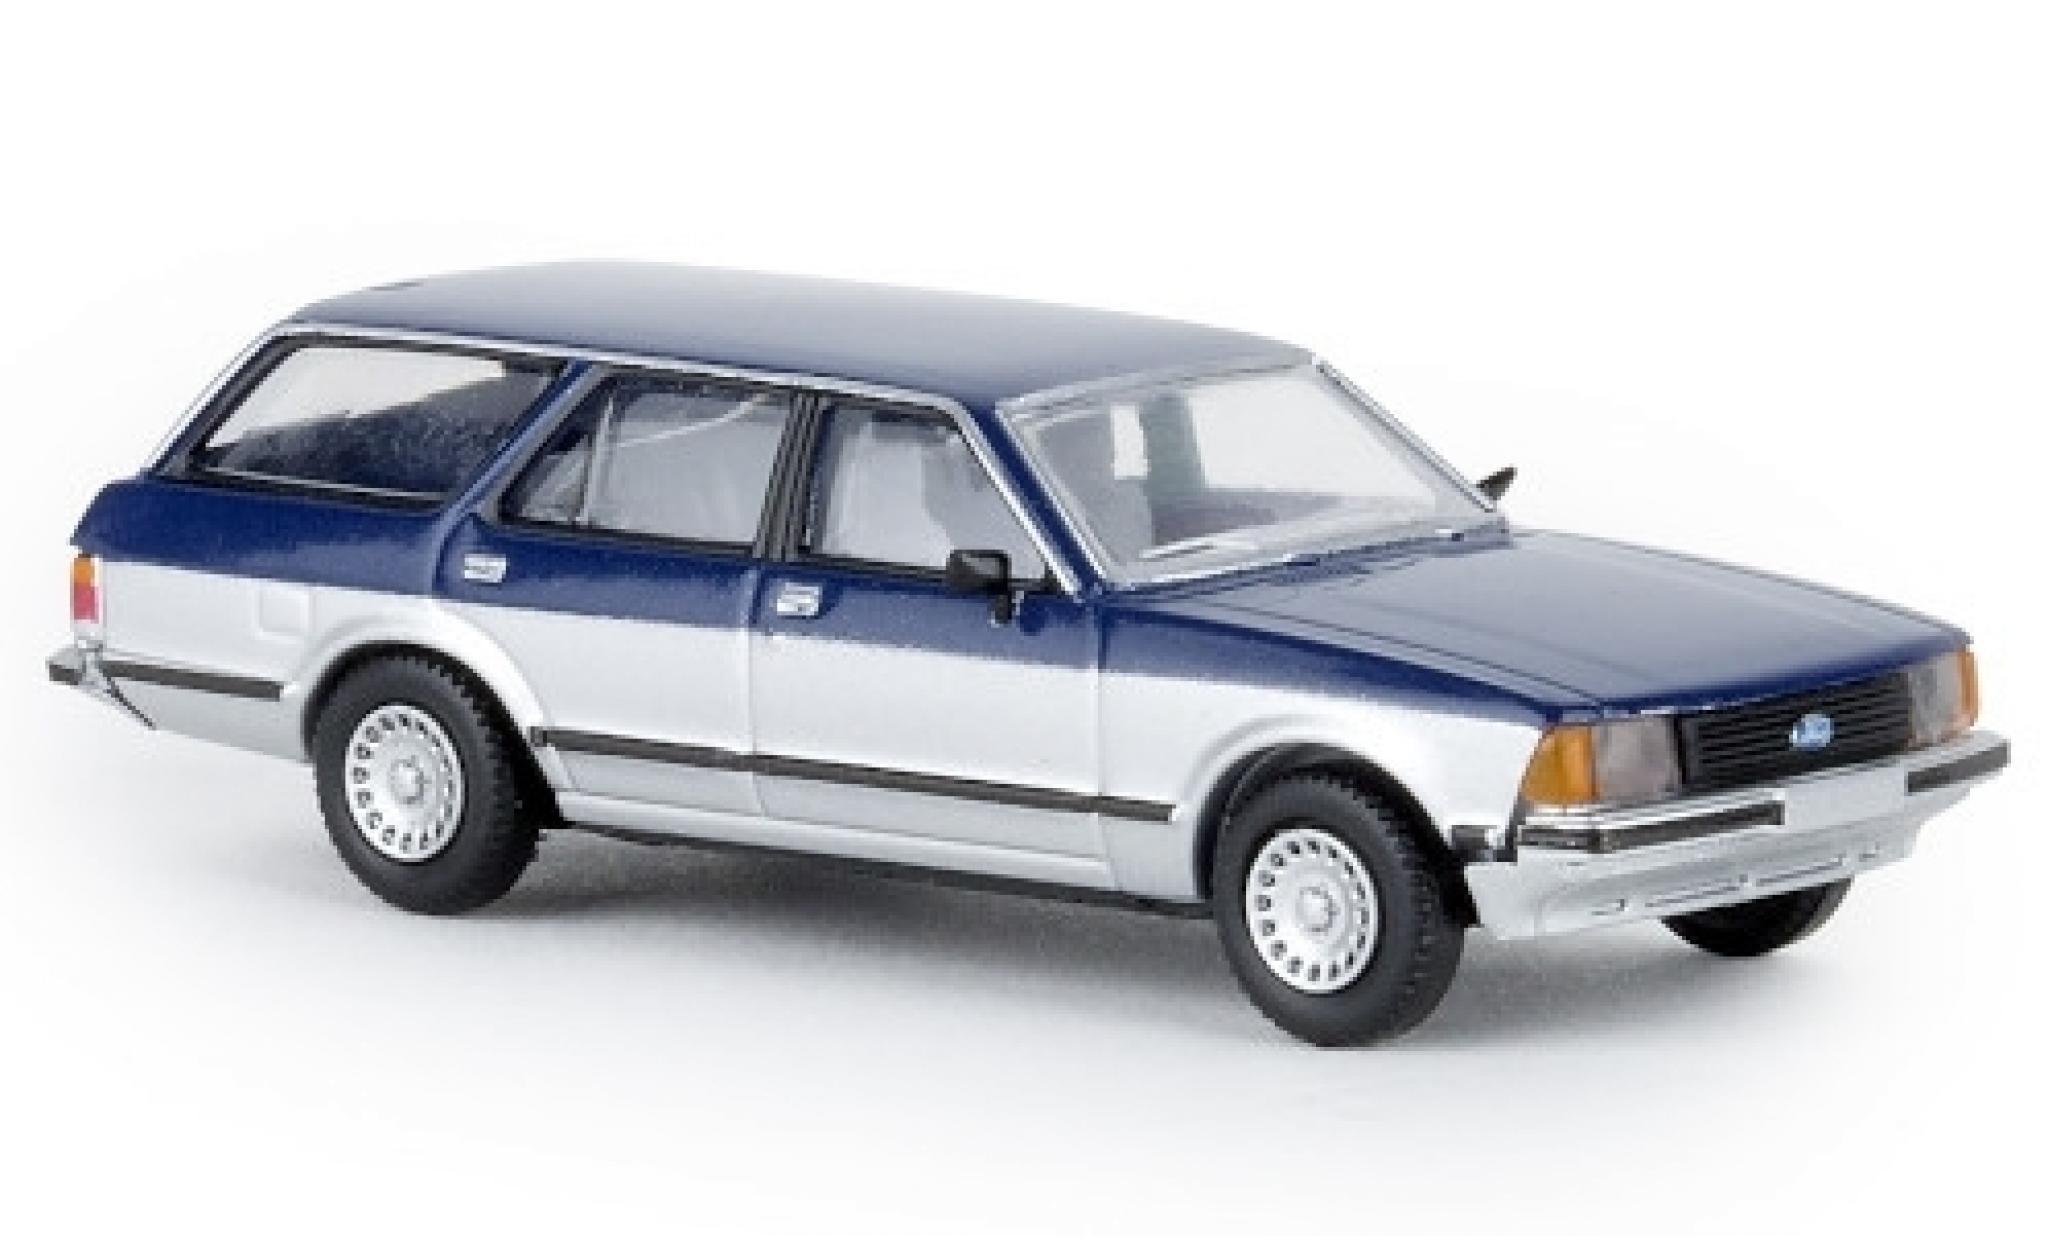 Ford Granada 1/87 Brekina II Turnier bleue/grise Sapphire 1977